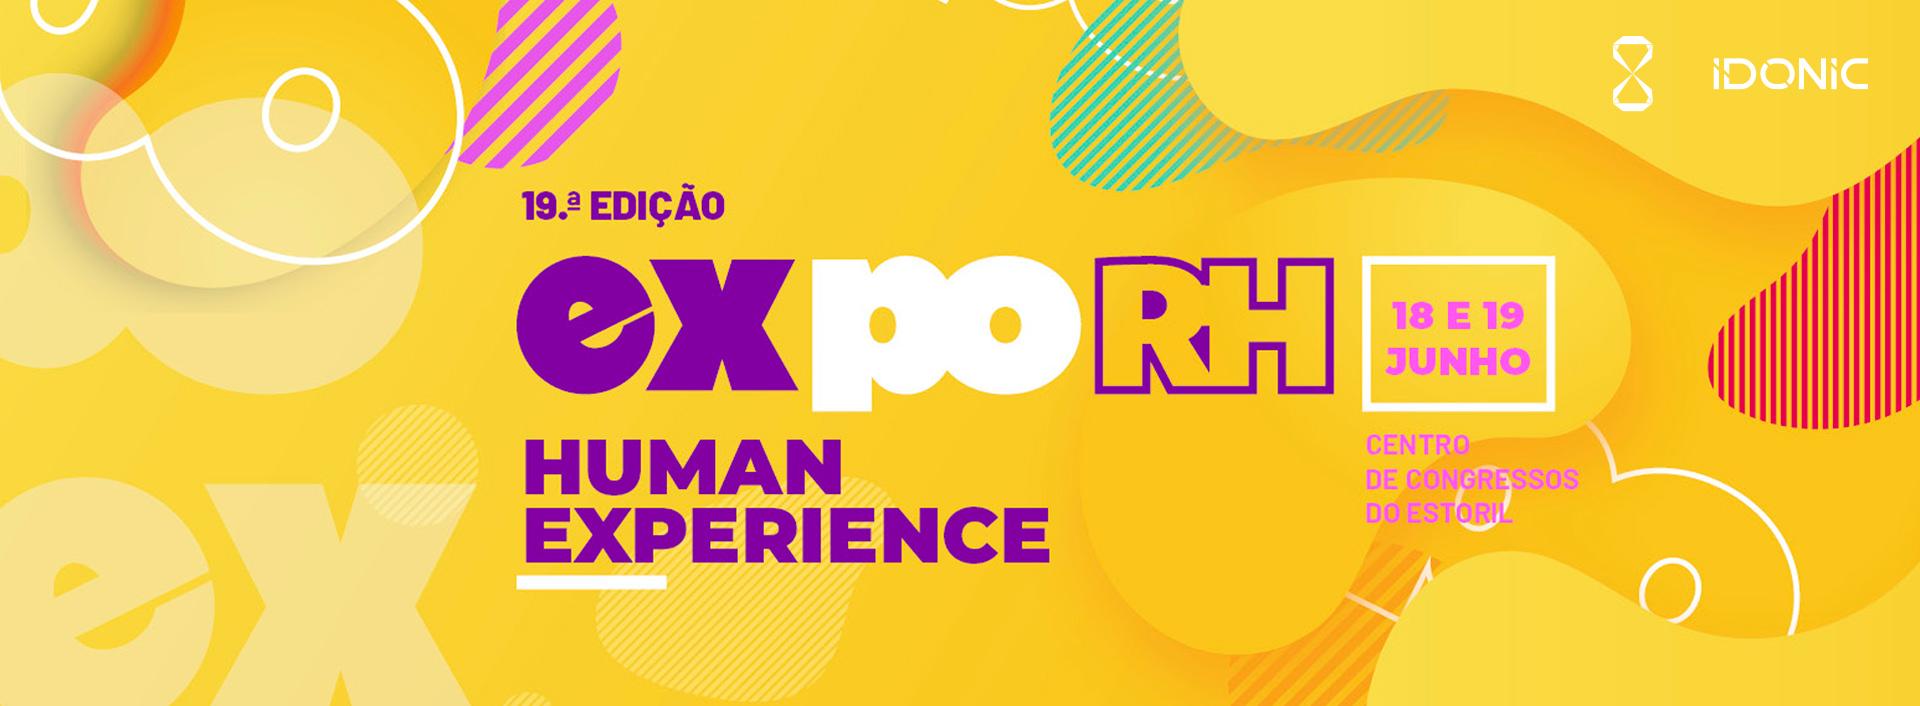 expo-rh-2020-idonic